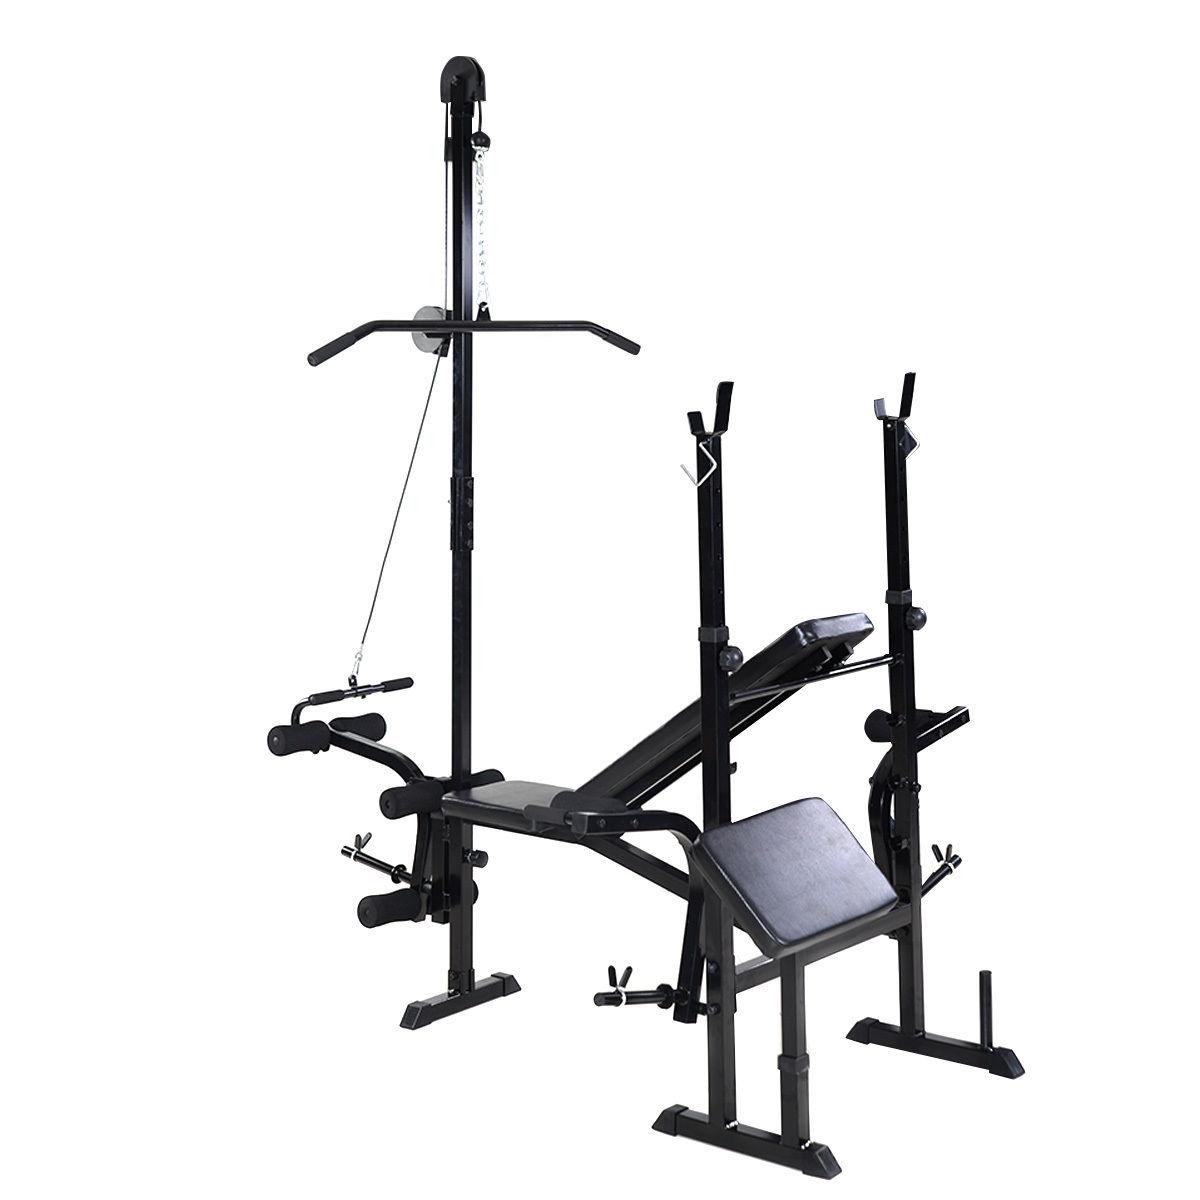 Adjustable Weight Lifting Flat Bench Rack Set Fitness Exerciser